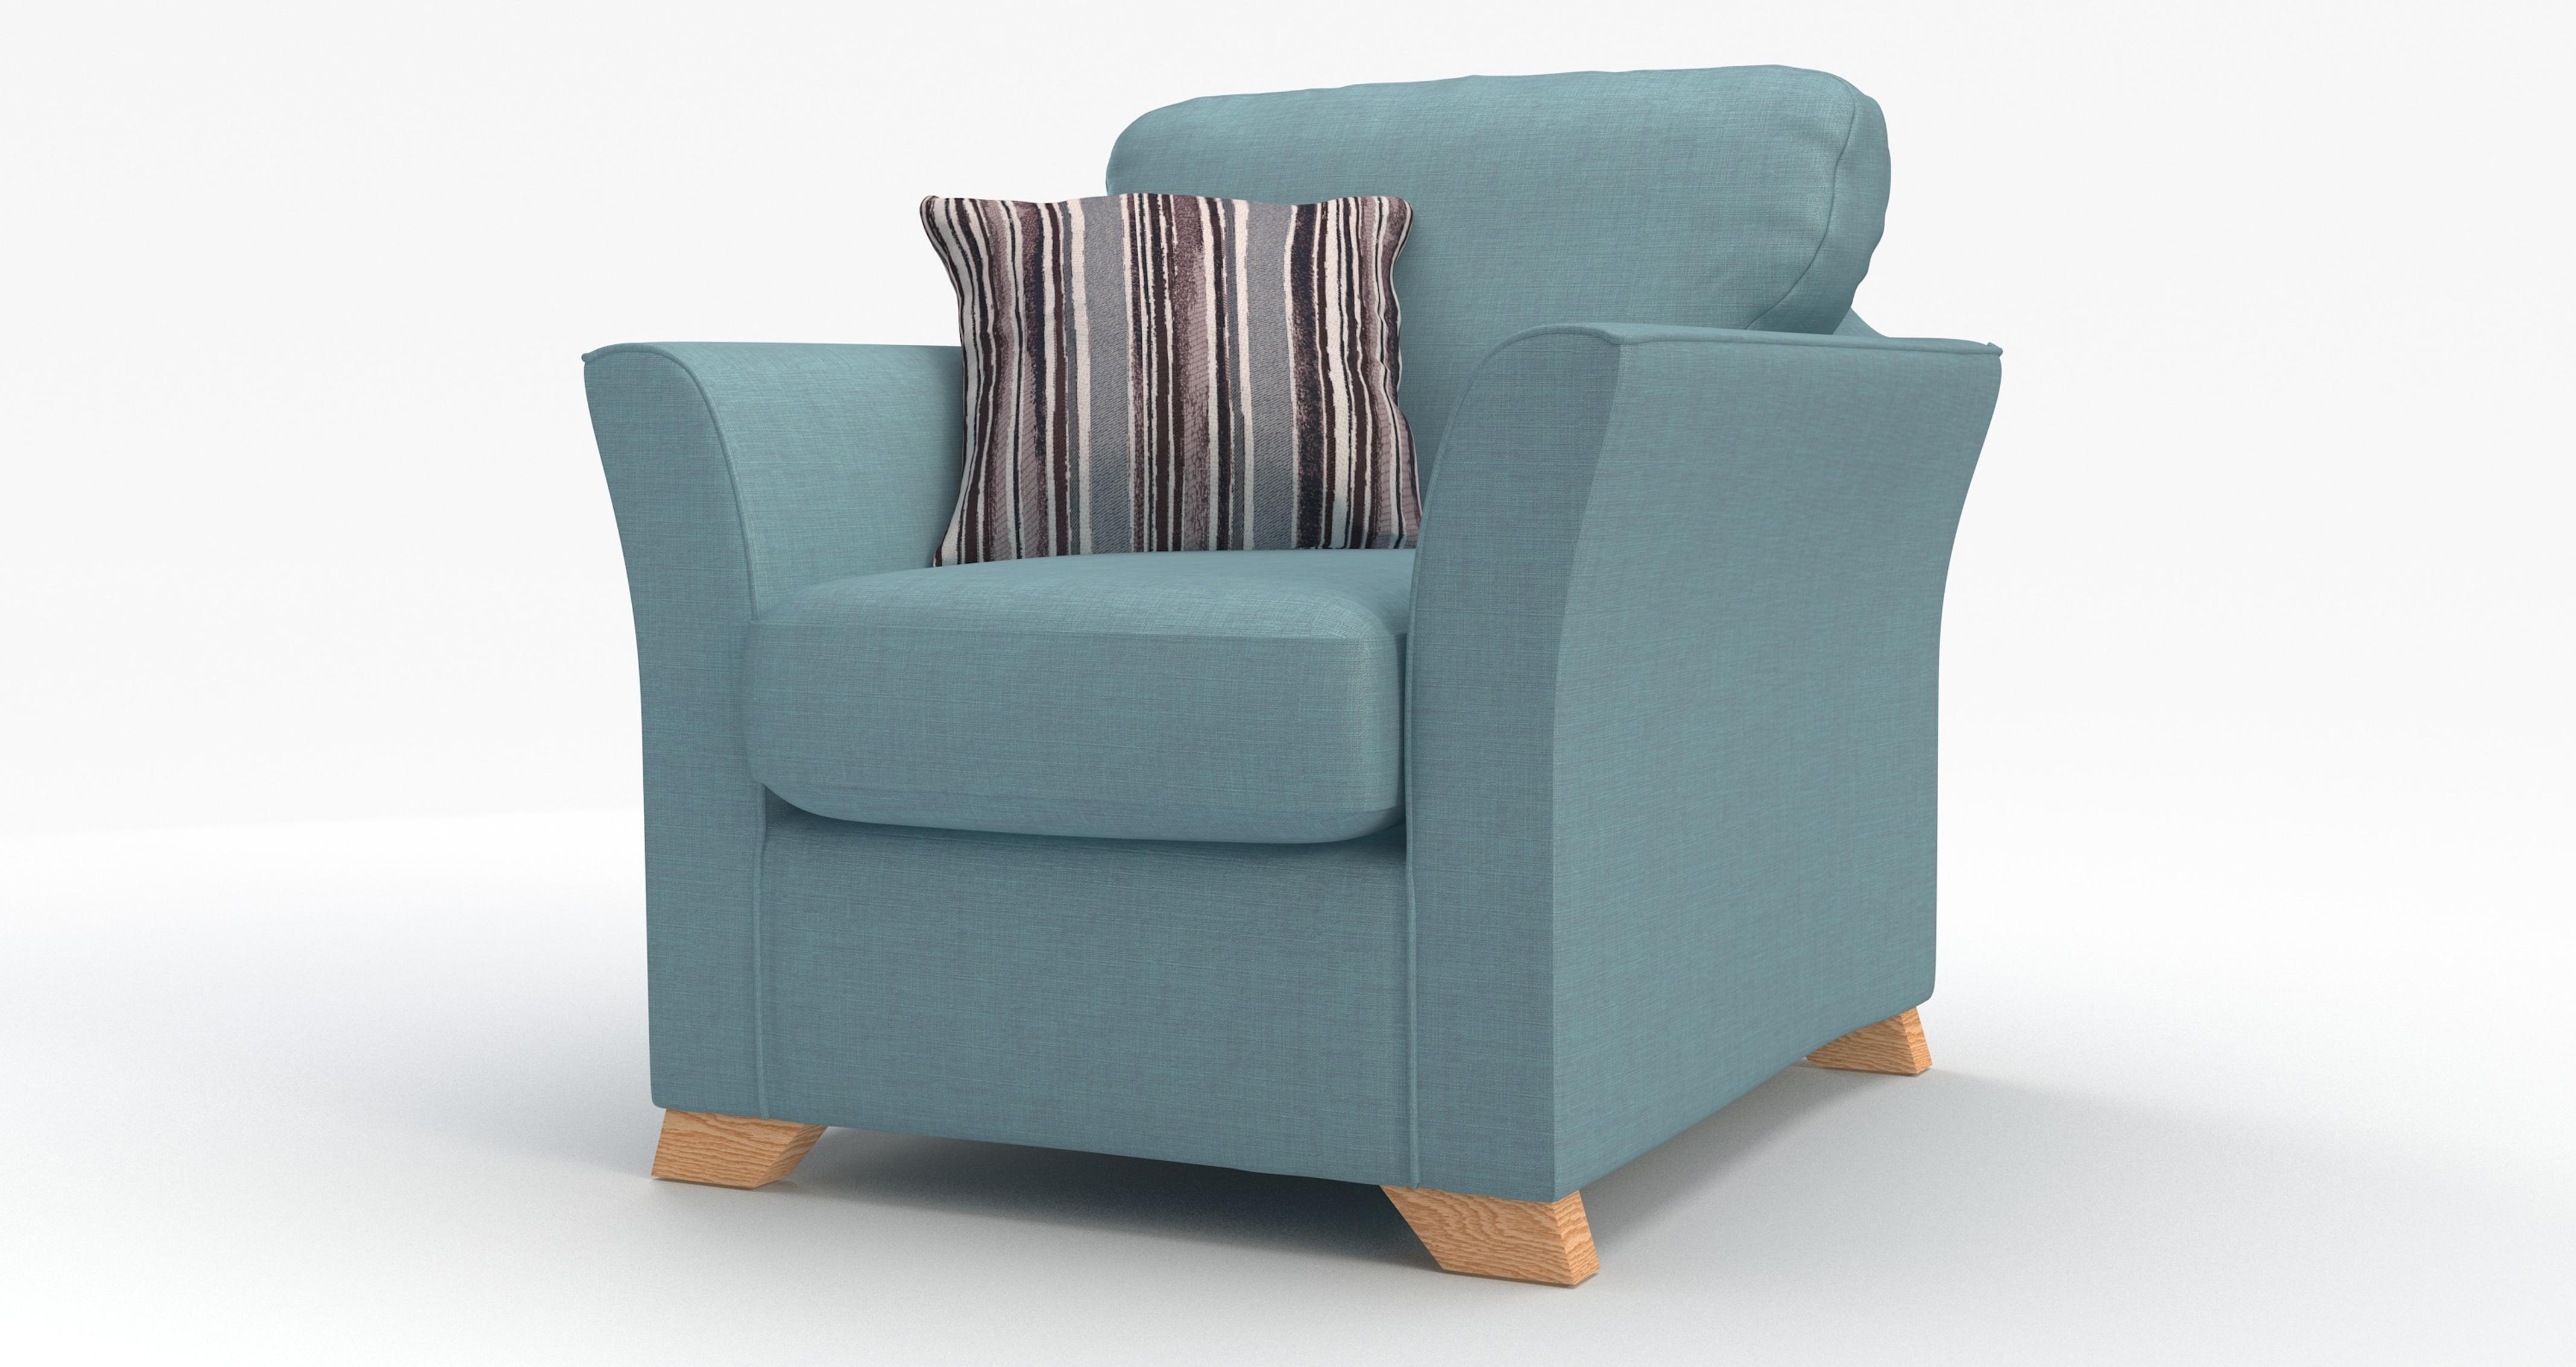 DFS Zuma Sky Blue Fabric Range - 3 Seater, 2 Str, Sofa Bed ...